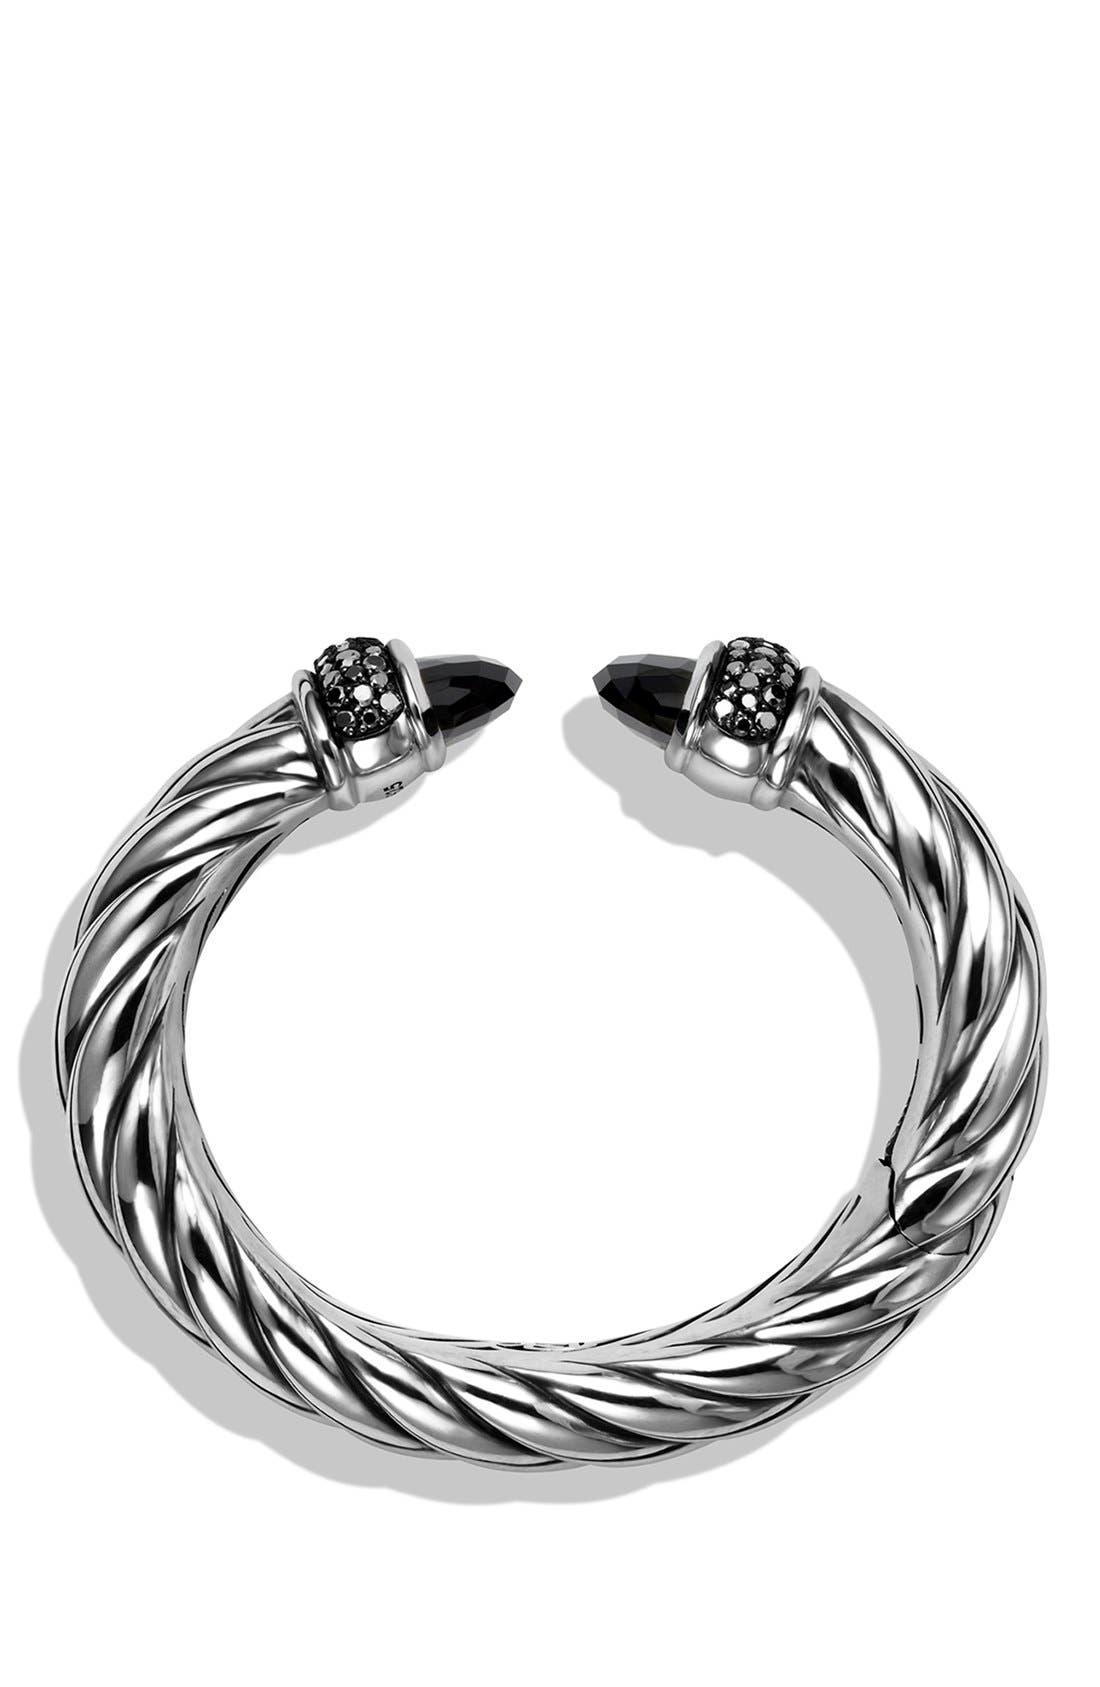 Alternate Image 2  - David Yurman 'Waverly' Bracelet with Semiprecious Stones & Gems